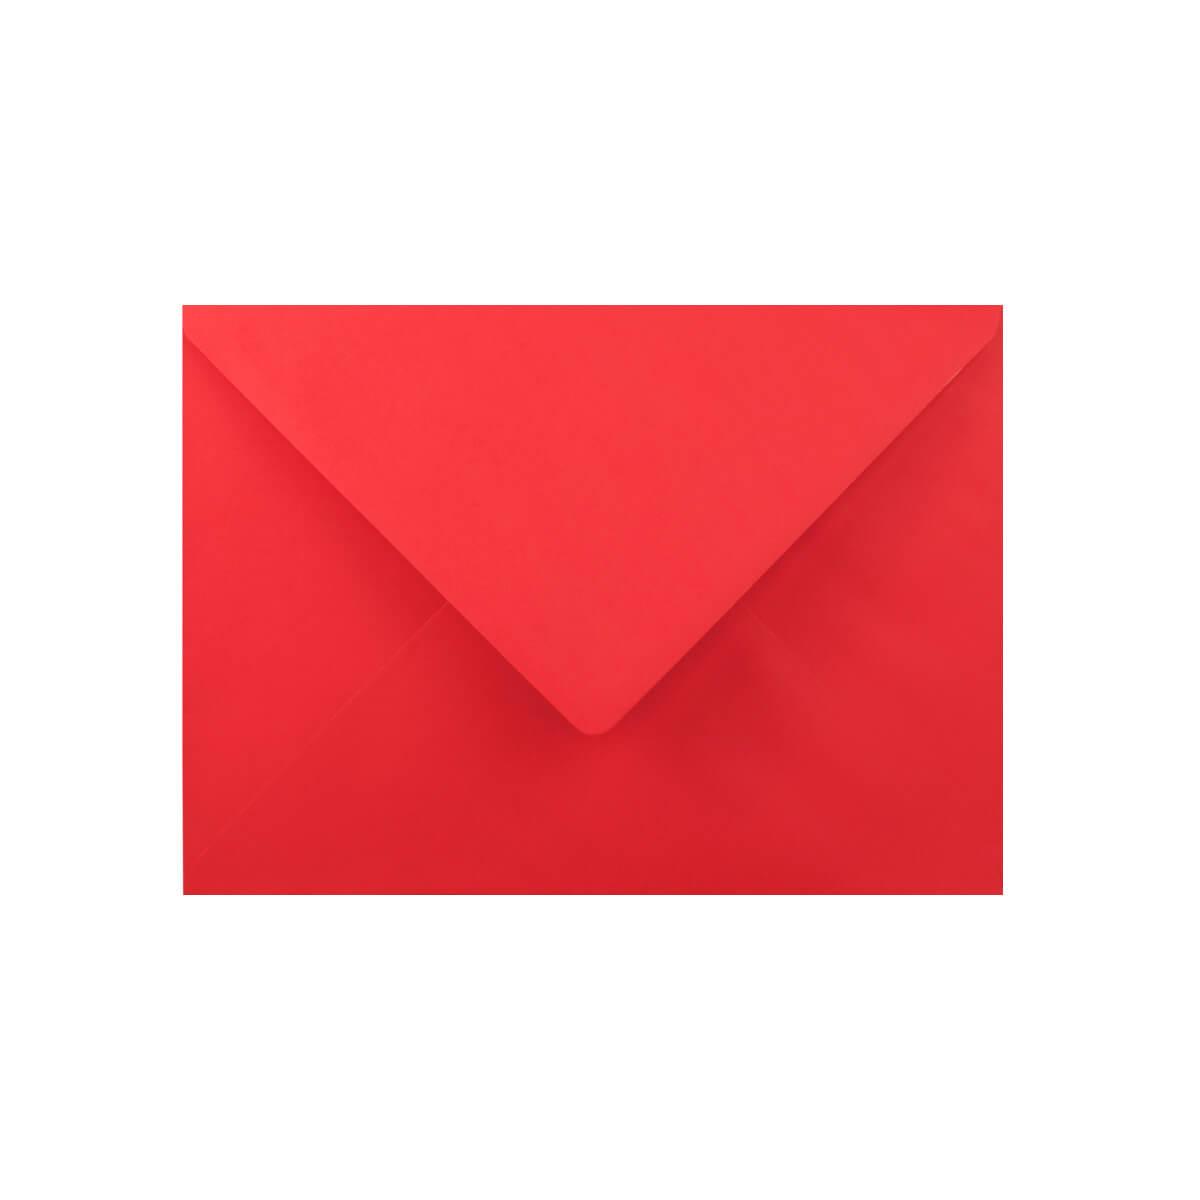 C4 RED ENVELOPES 120GSM